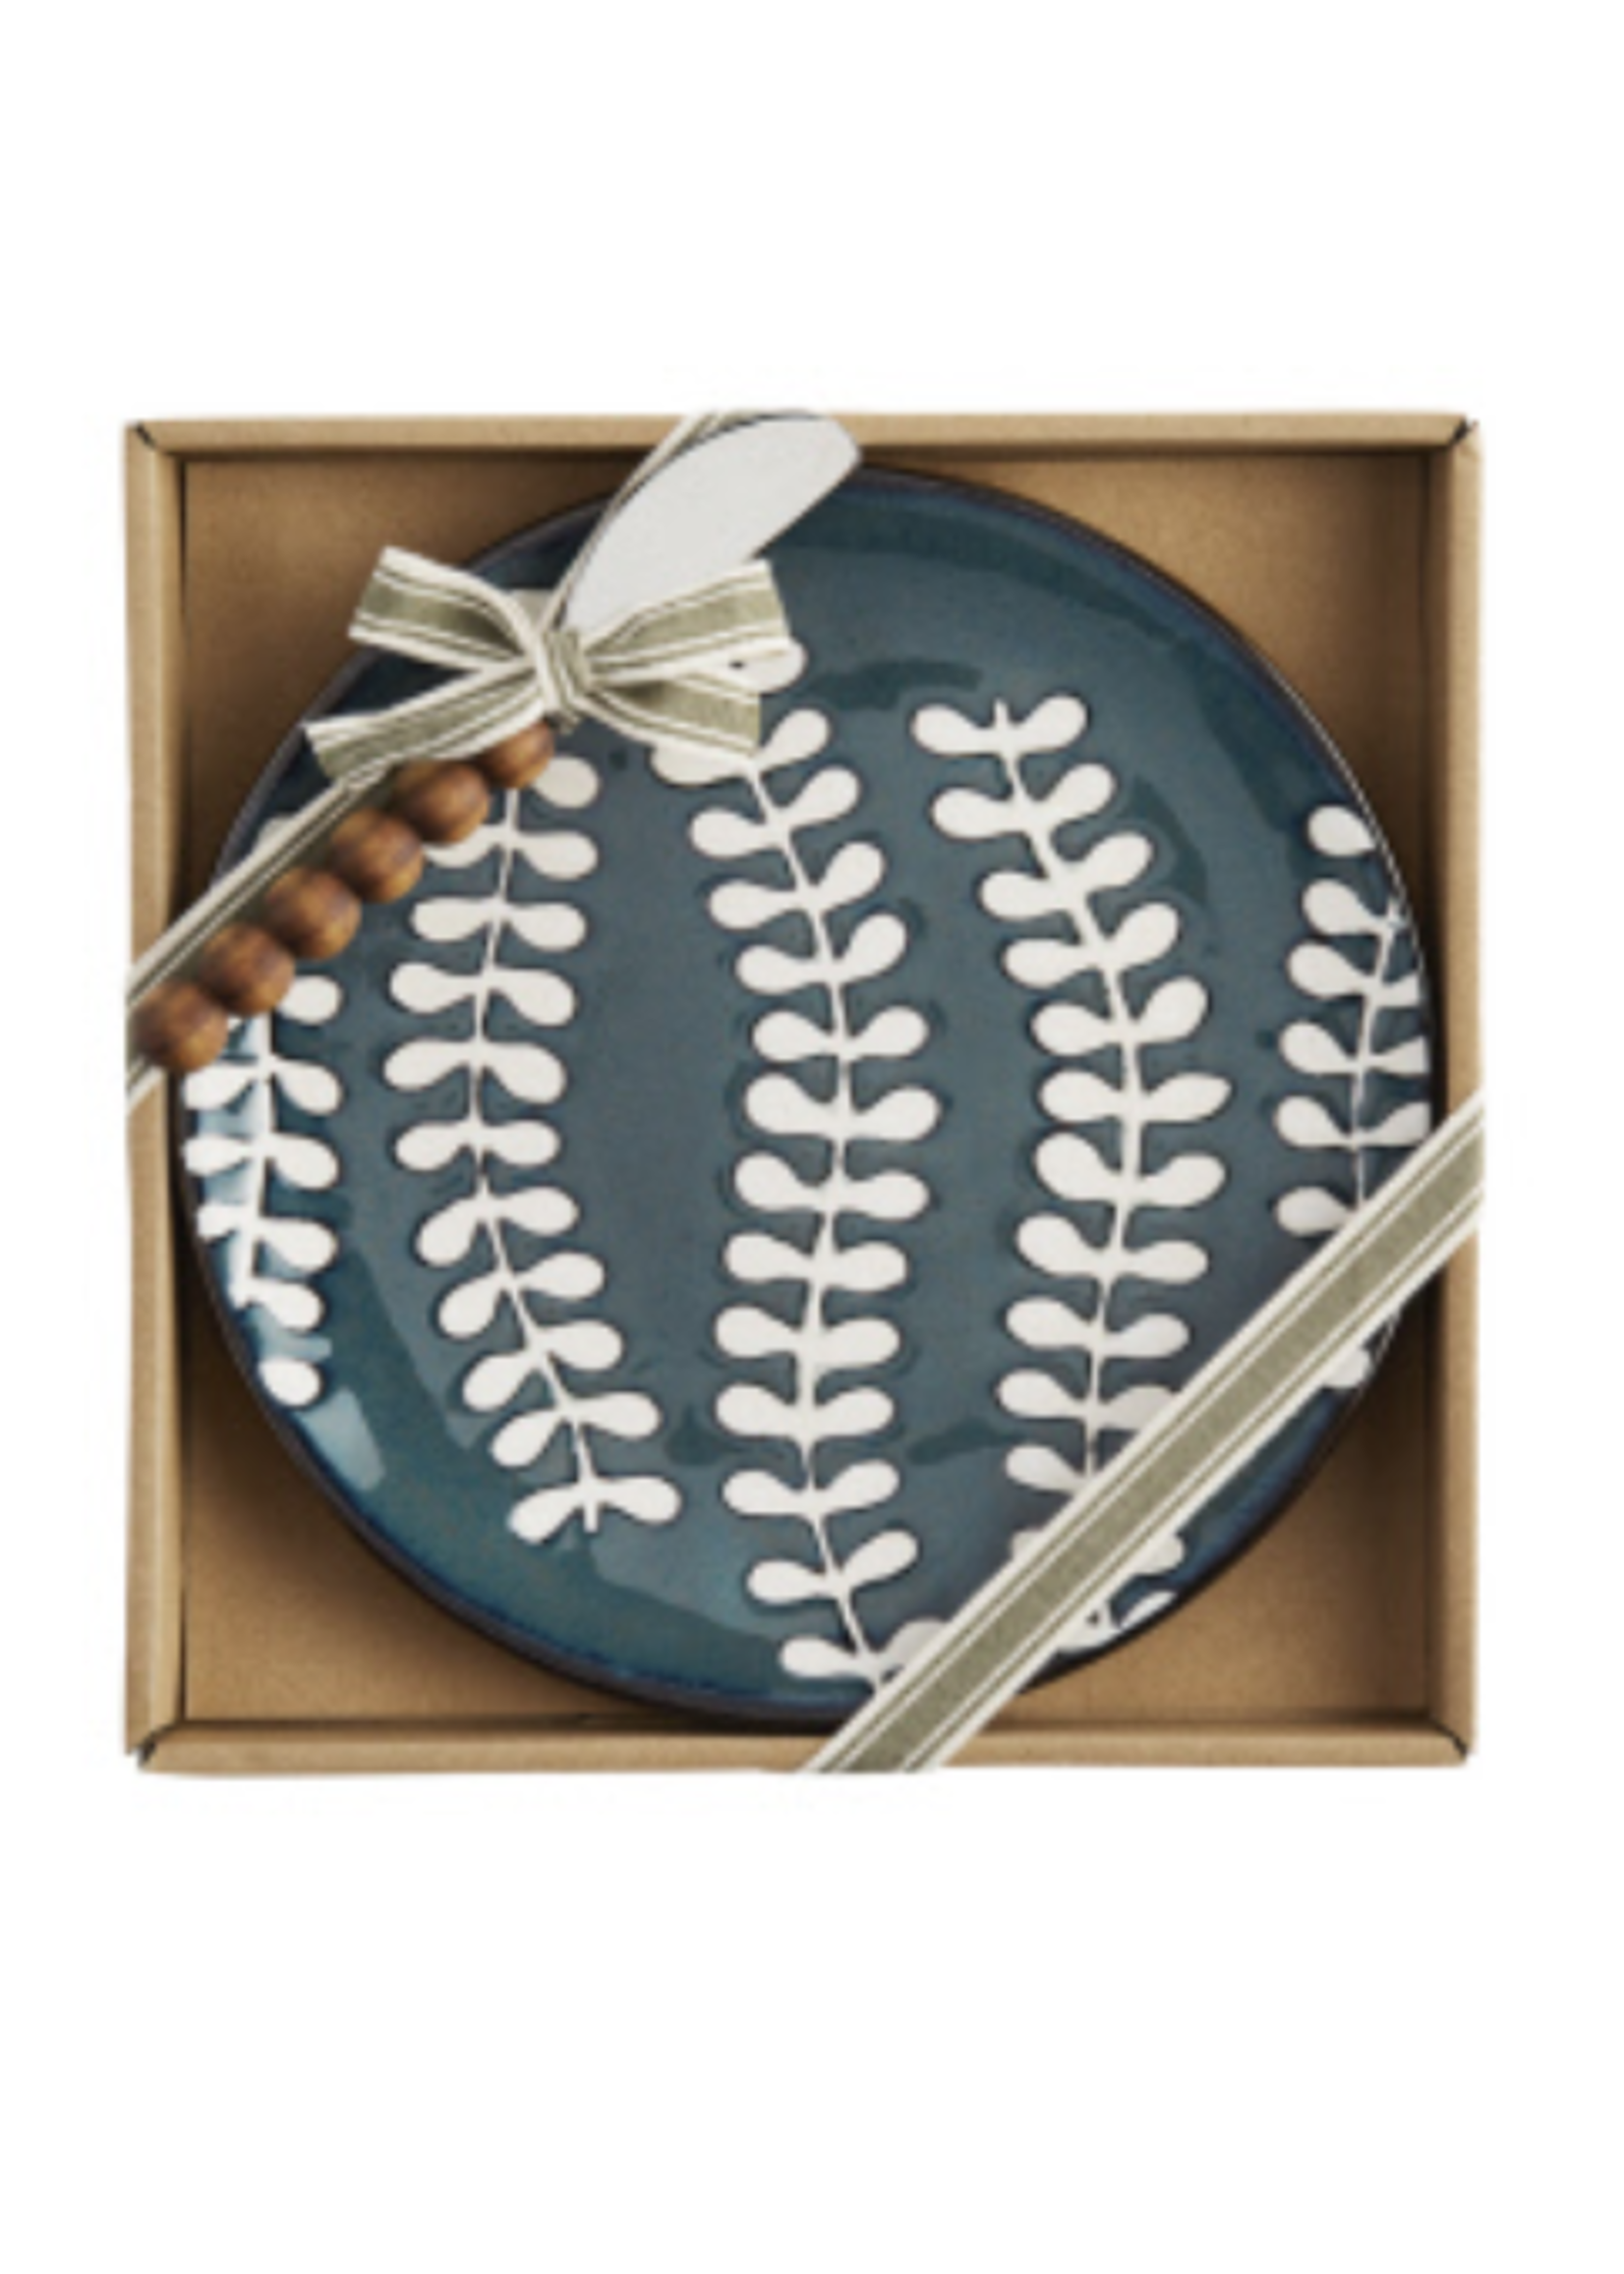 Mud Pie Blue Leaf Cheese Set